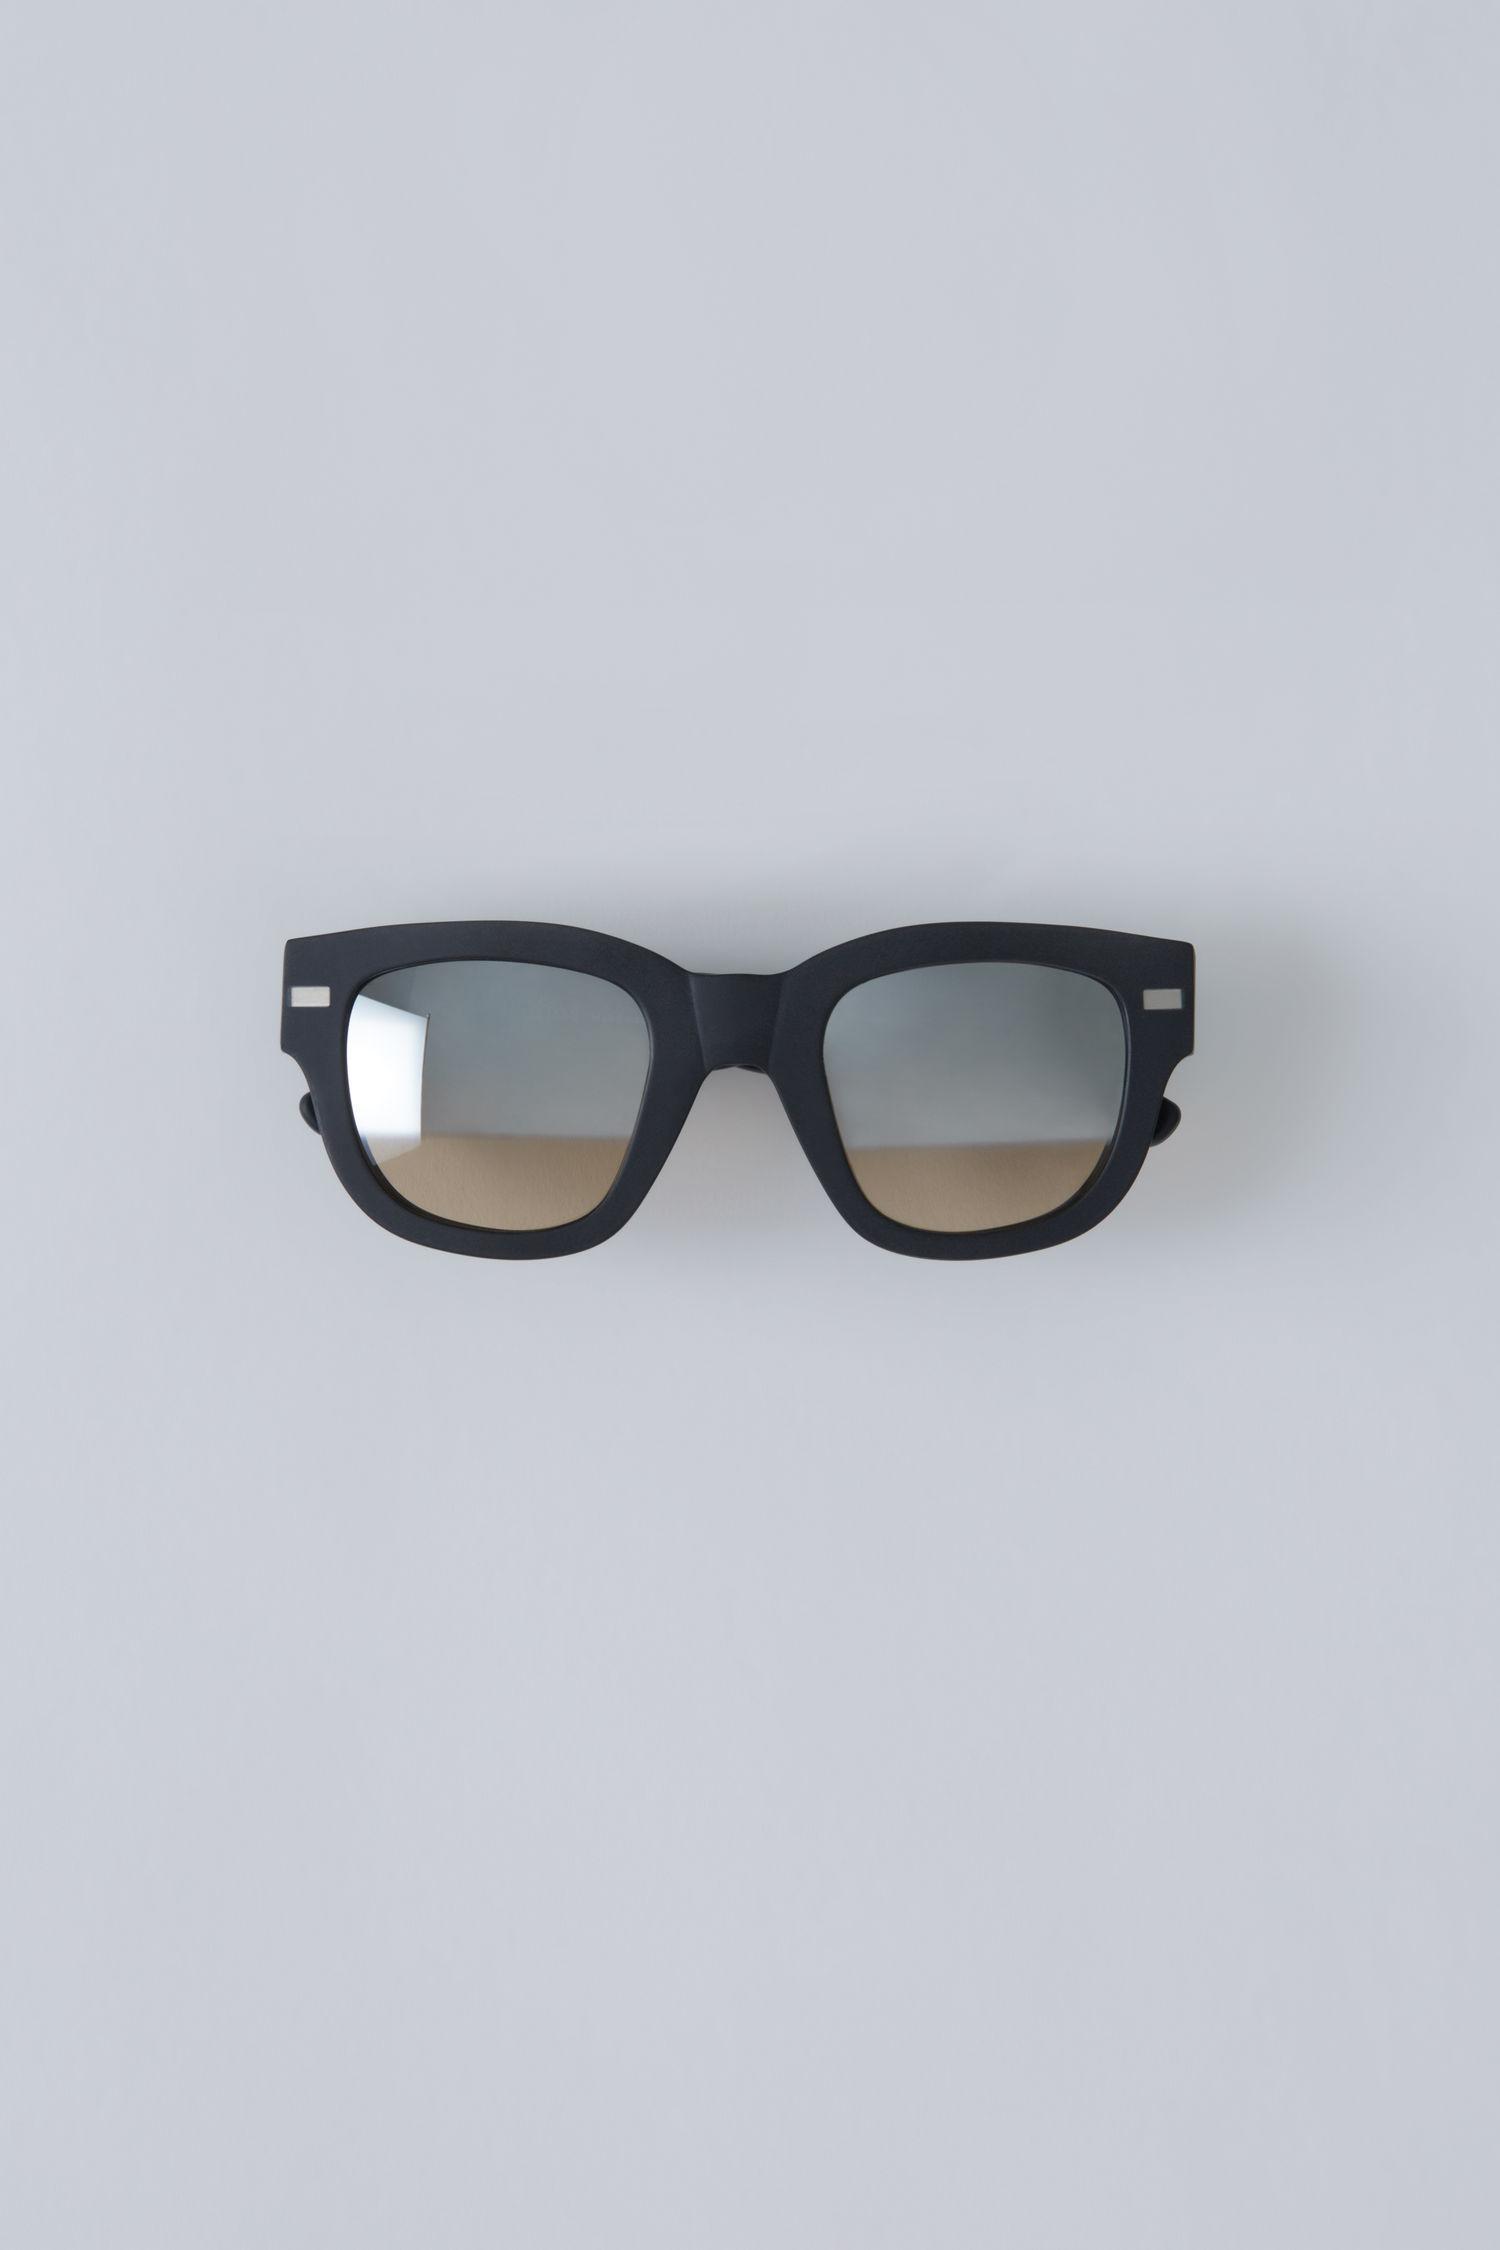 Acne Studios Square Frame Eyewear Matt Black/Silver Half Mirror